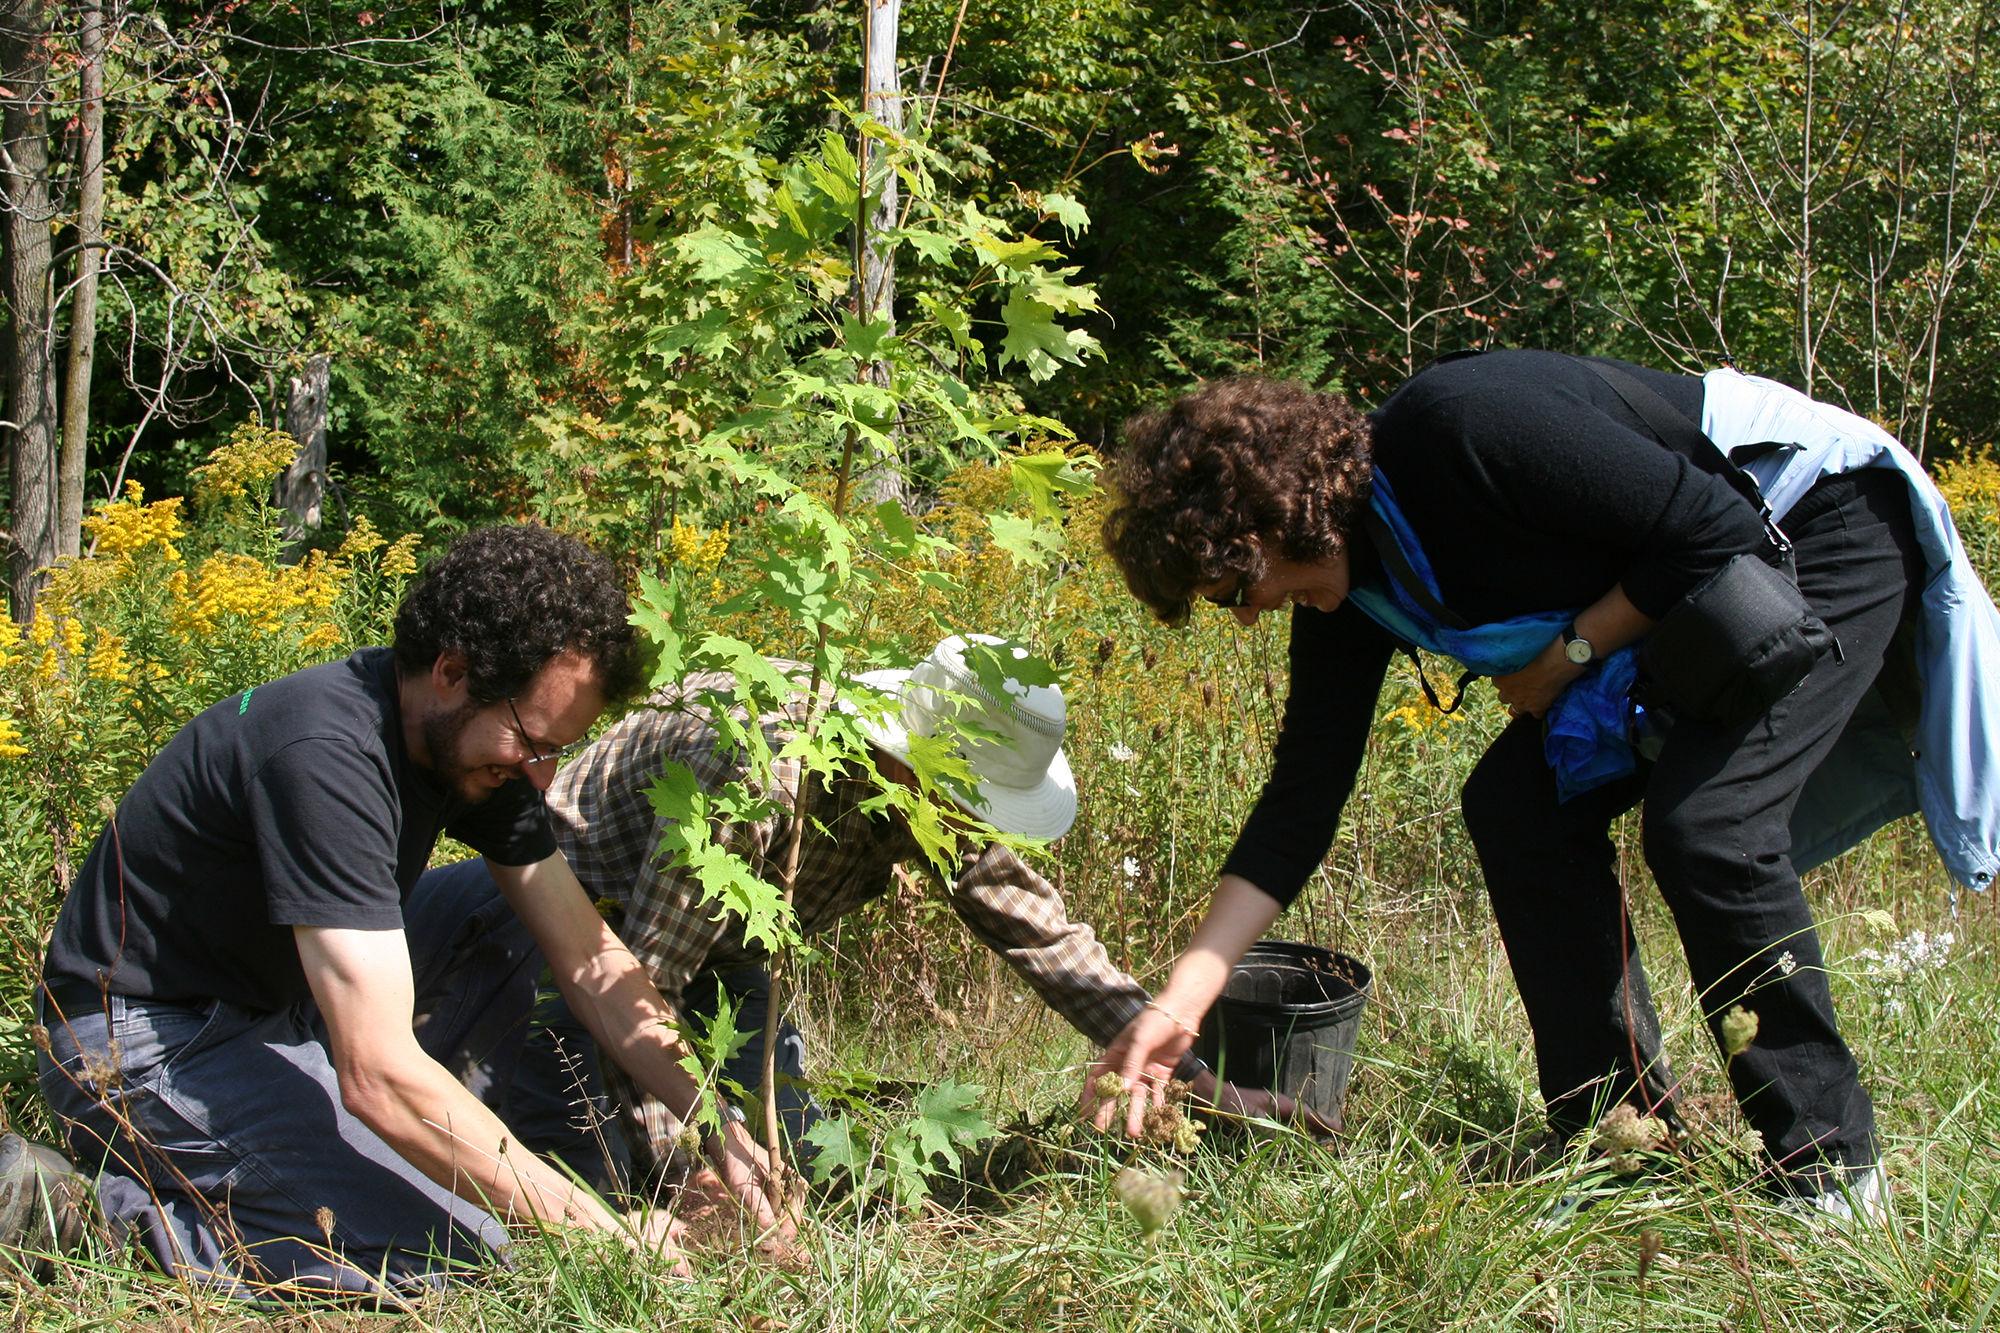 tree planting at Cawthra Mulock nature reserve